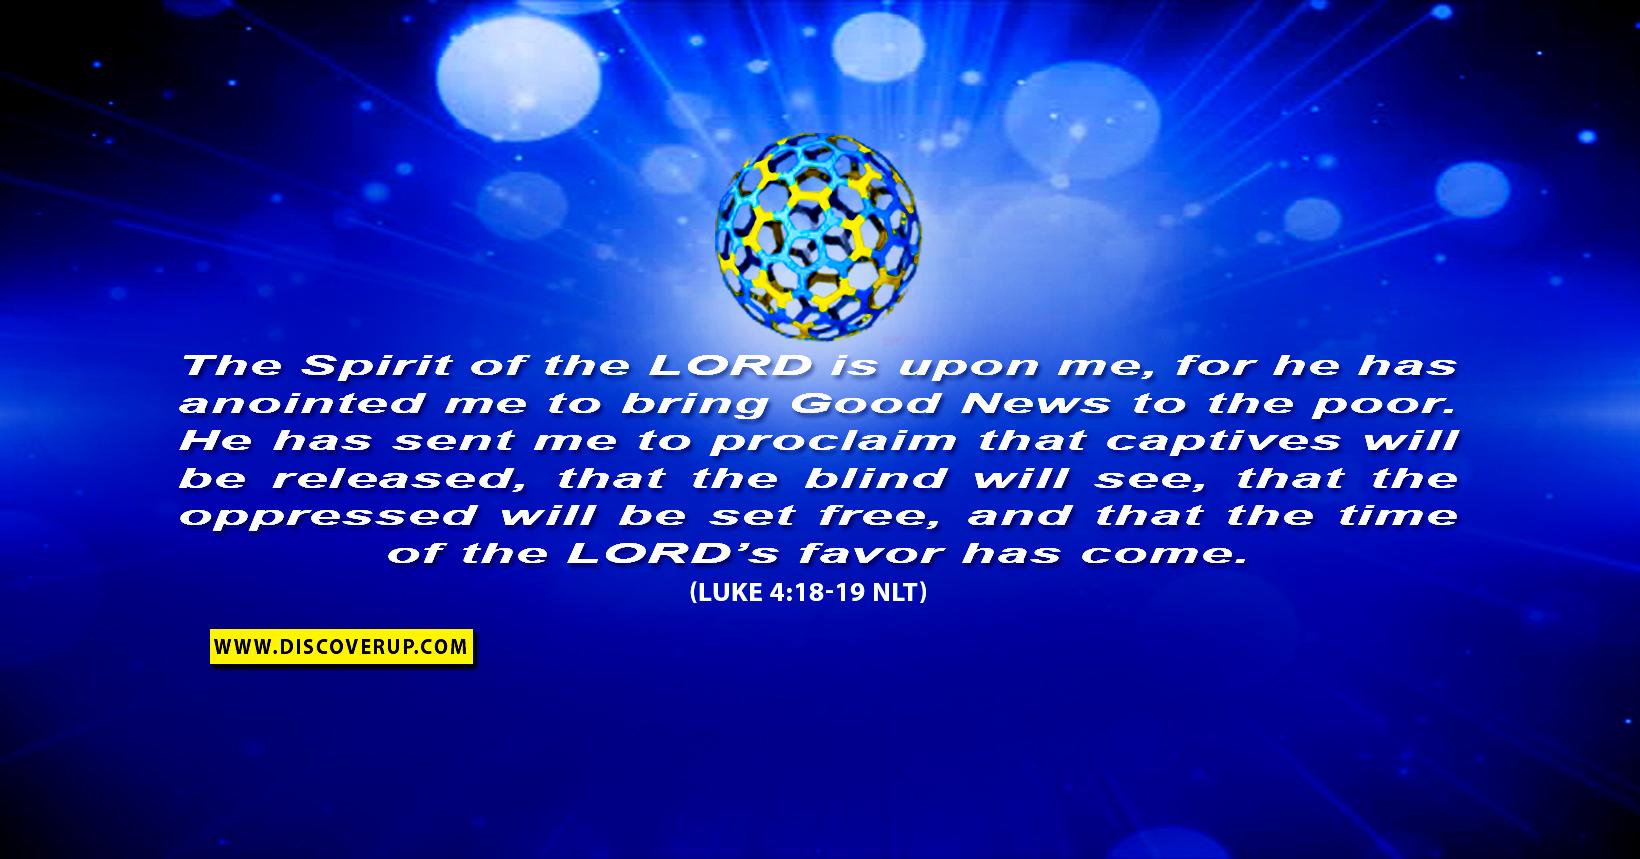 DiscoverUp.com Bible Verse